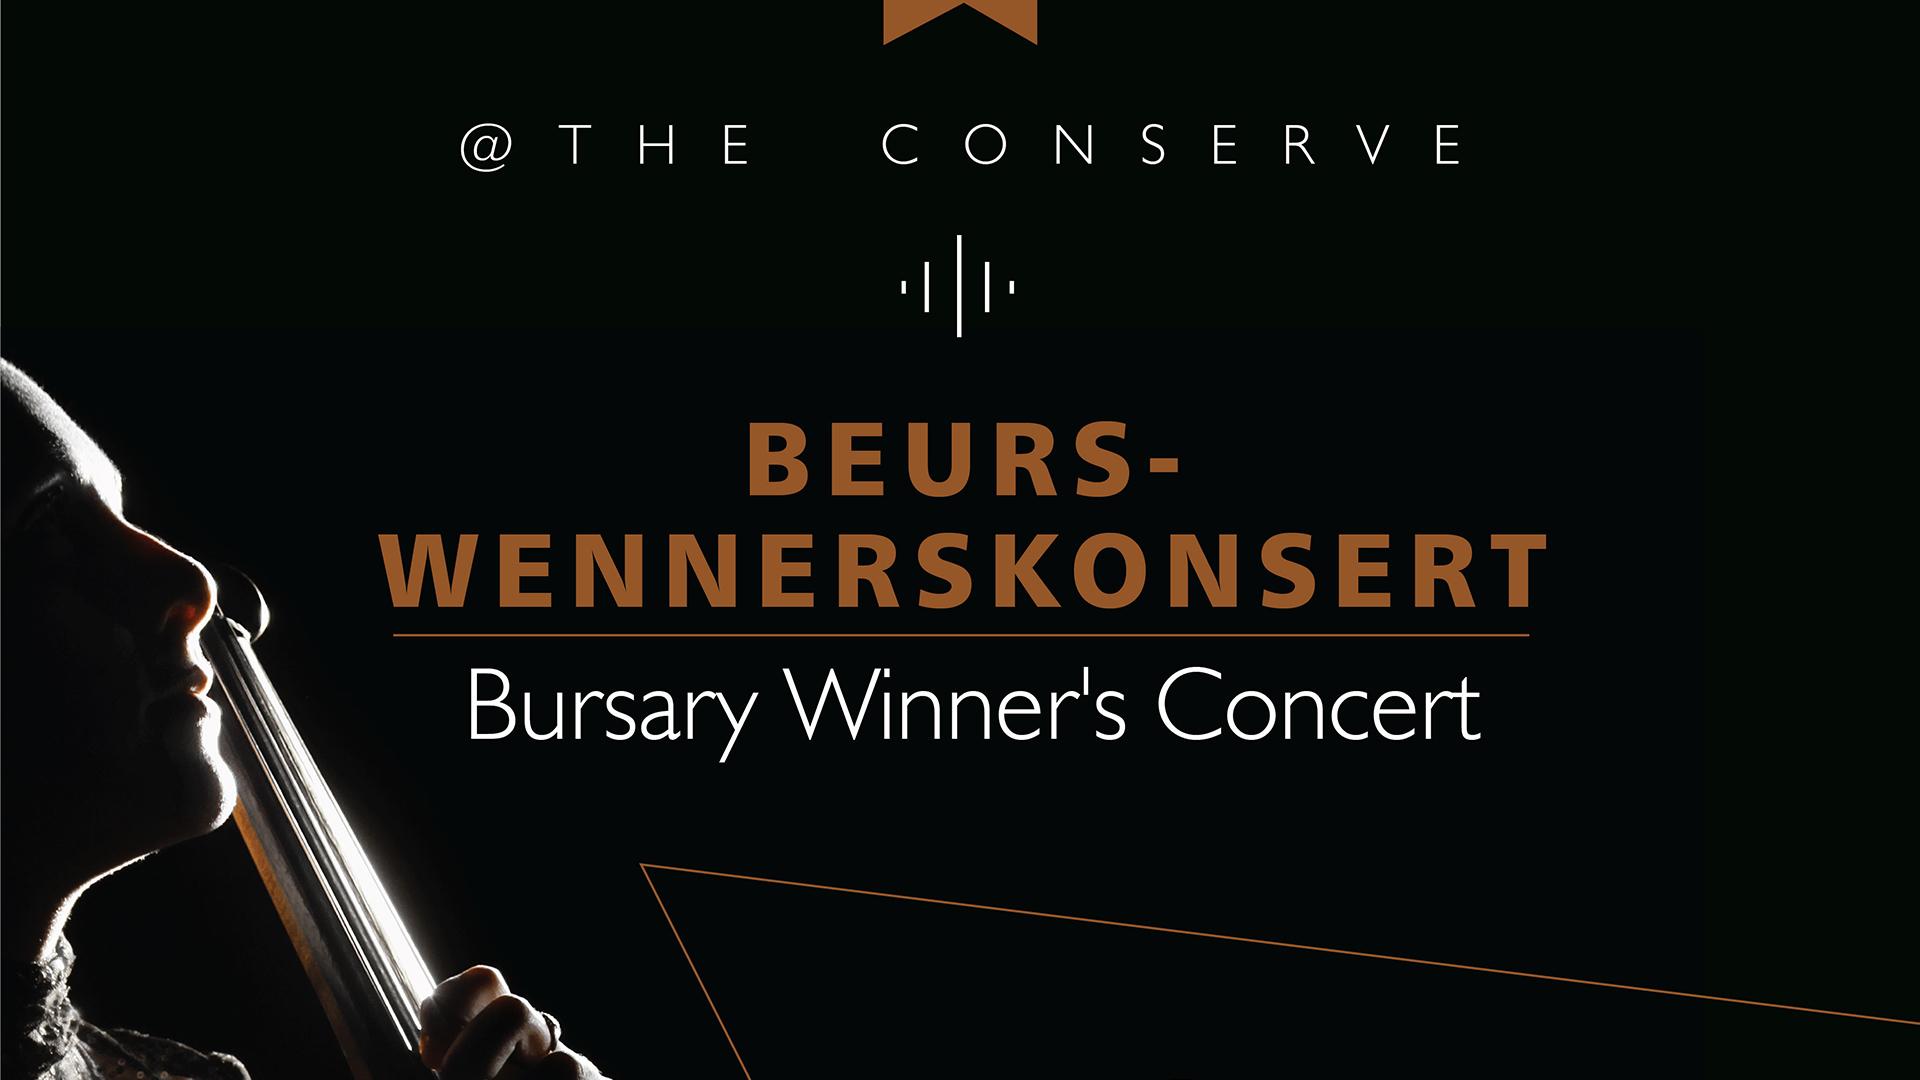 Bursary Winners' Concert — 20 October 2015